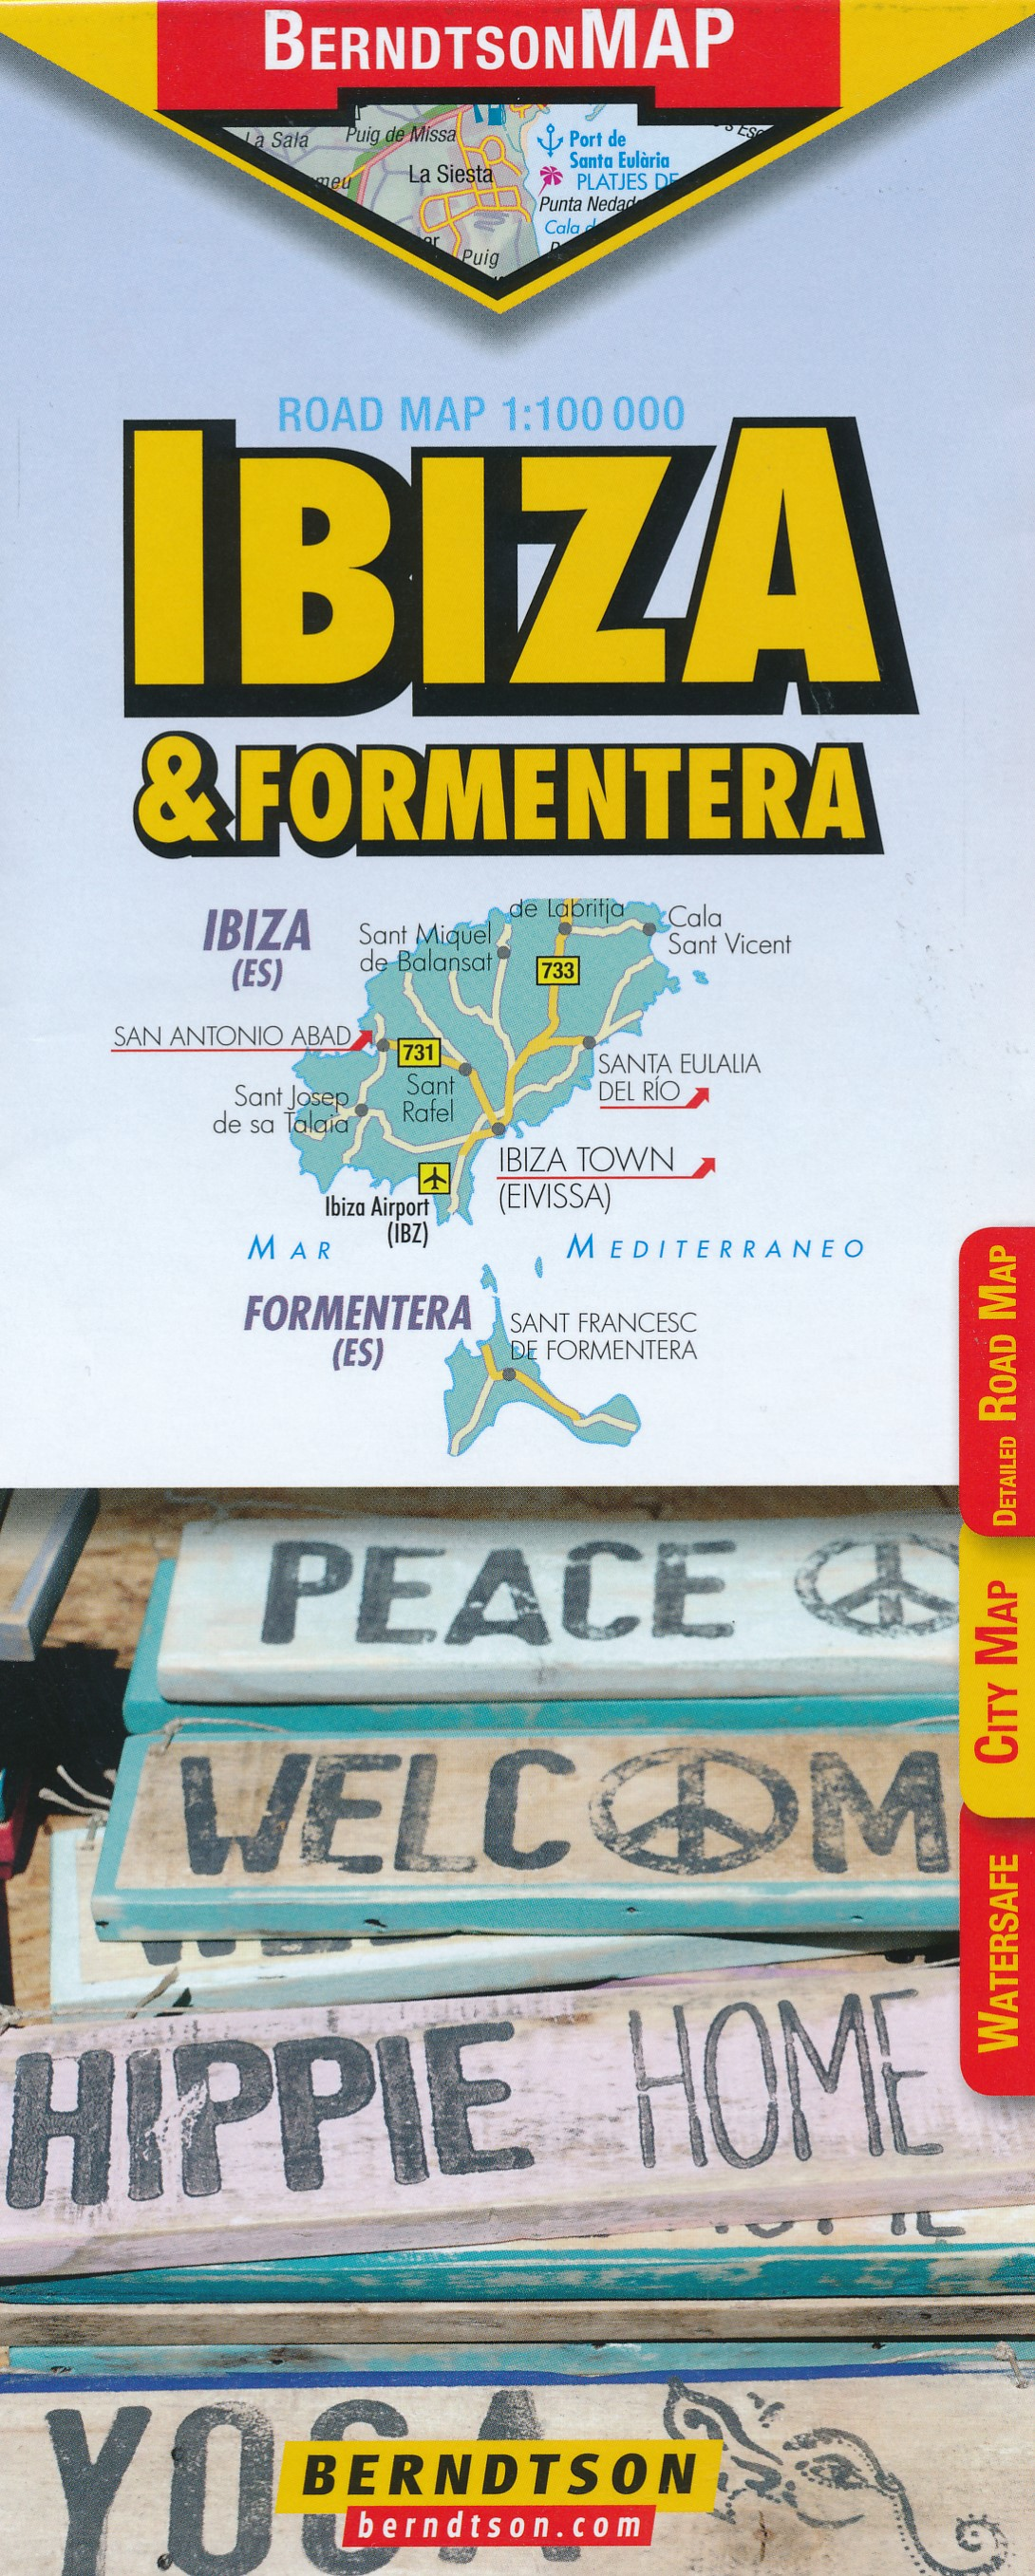 Wegenkaart - landkaart Ibiza | Berndtson